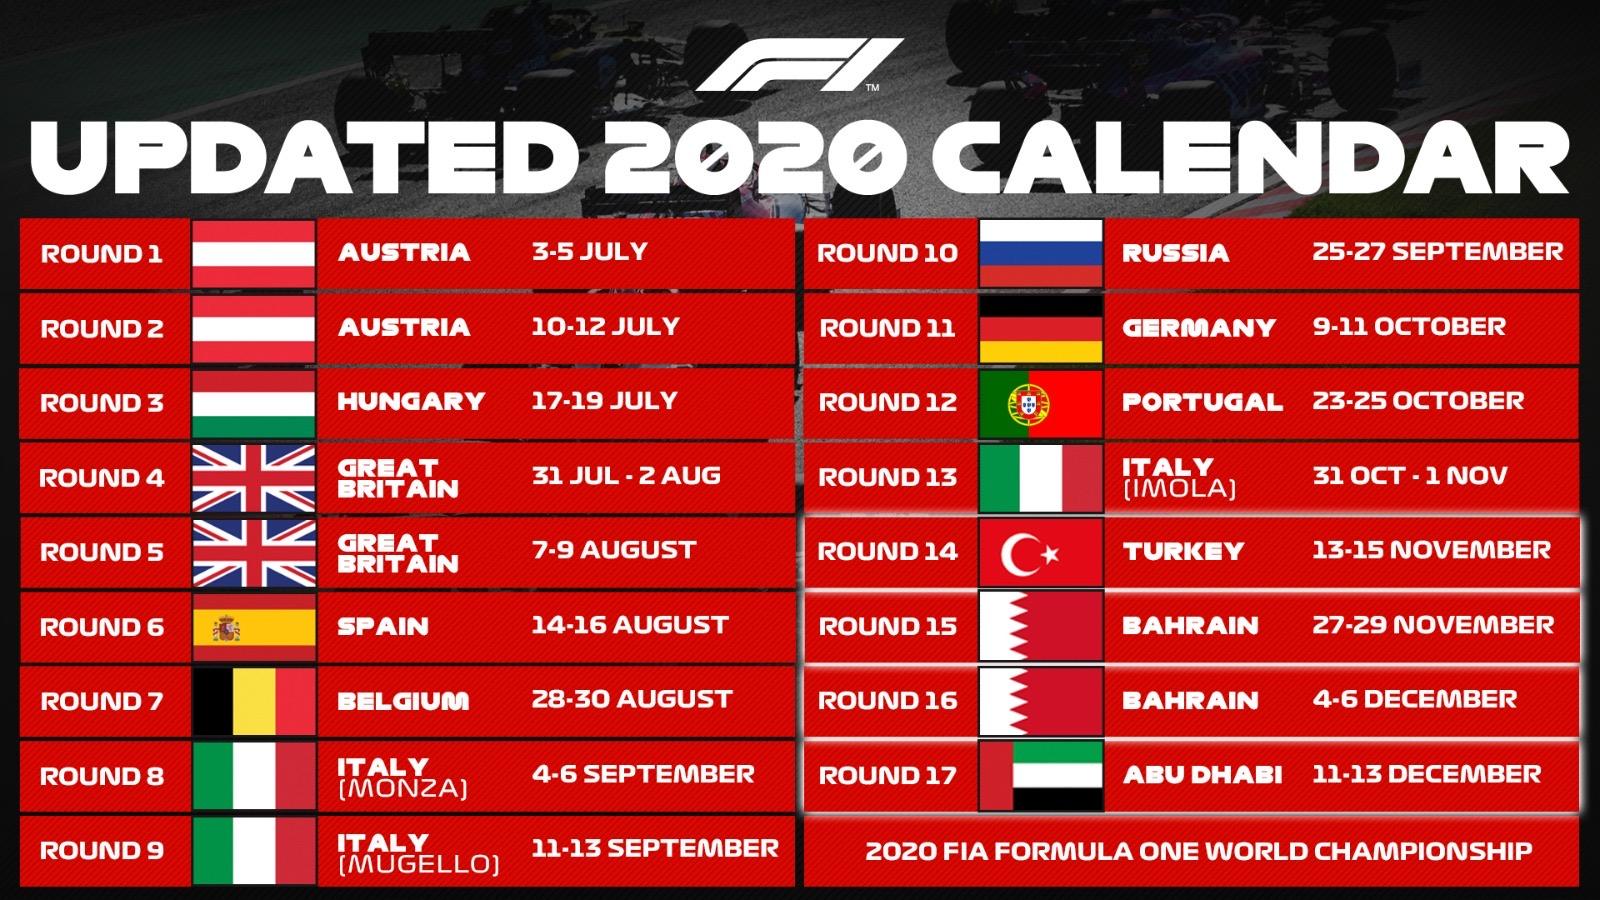 2020 FIA Formula One World Championship Calendar (Image Credit-Bleachernews)